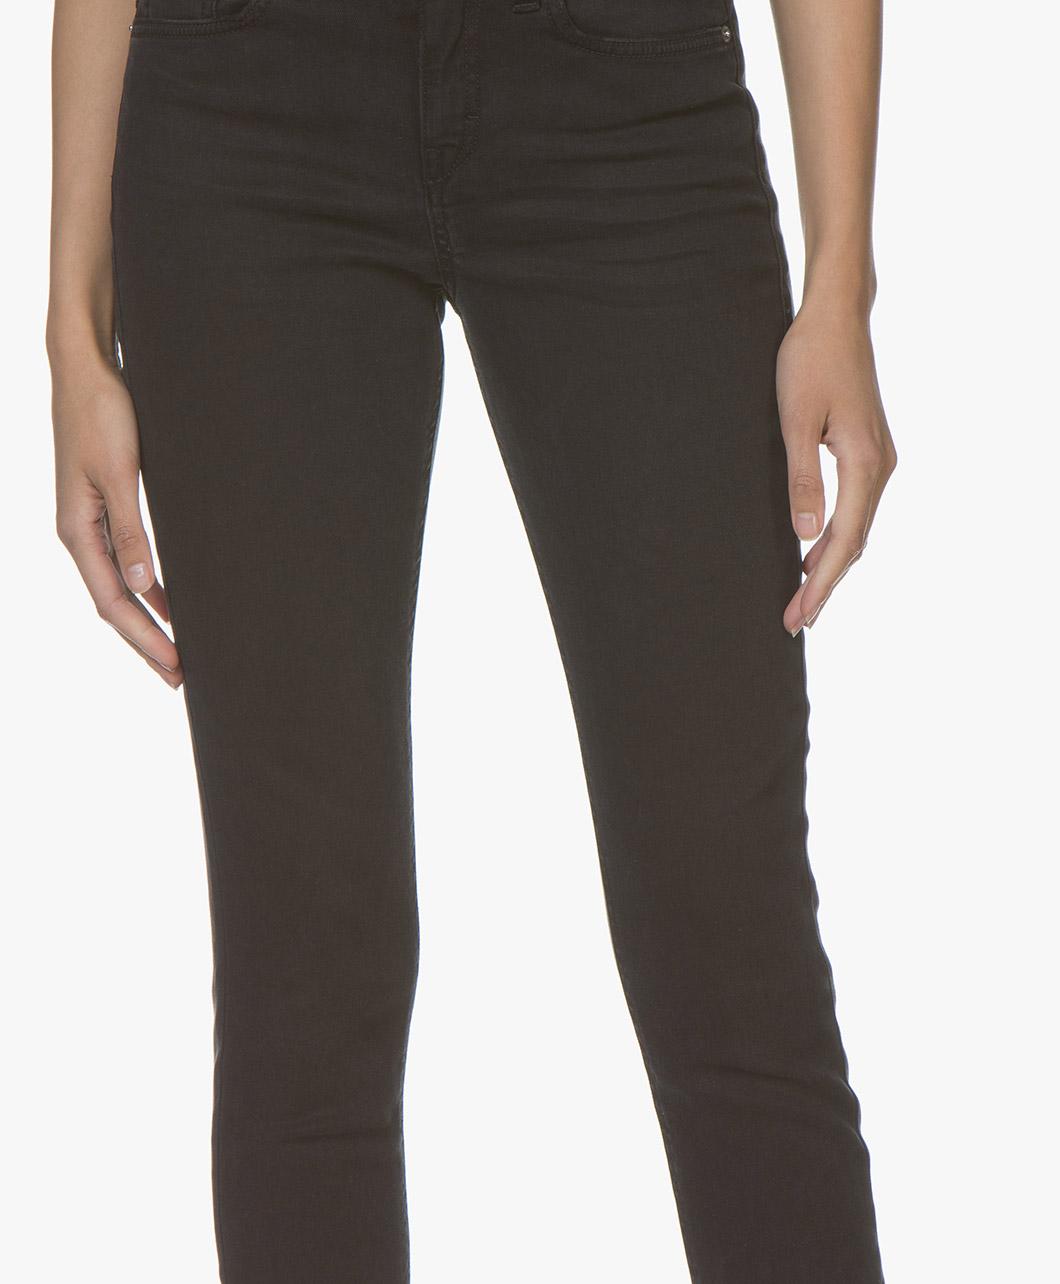 cb27797d6fdb1a 181122-Drykorn-NEED-Stretchy-Skinny-Jeans---Zwart--869.jpg